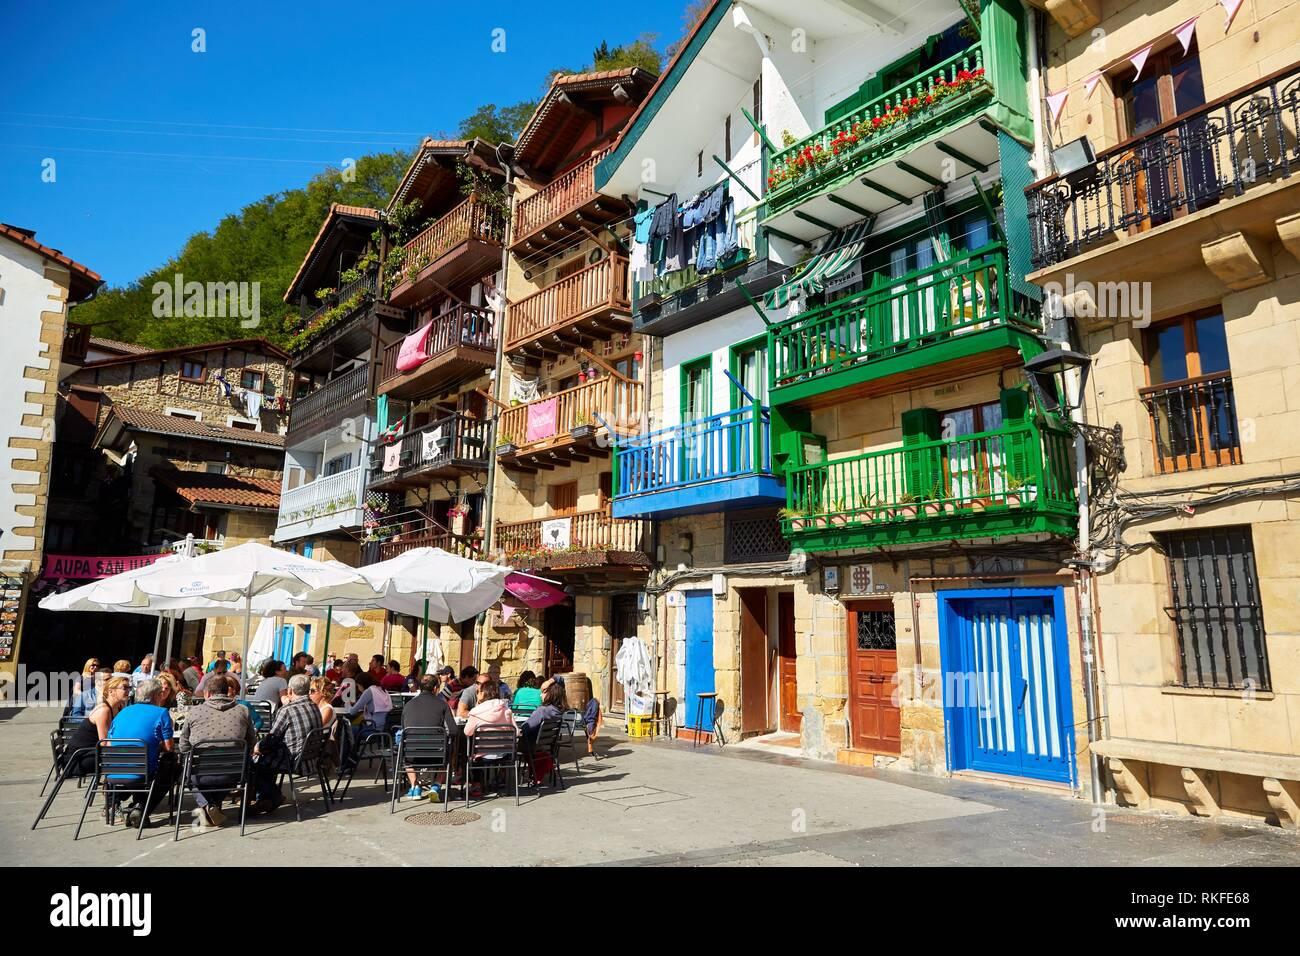 Plaza Santiago, Pasai Donibane, Pasajes de San Juan, Gipuzkoa, Basque Country, Spain, Europe - Stock Image